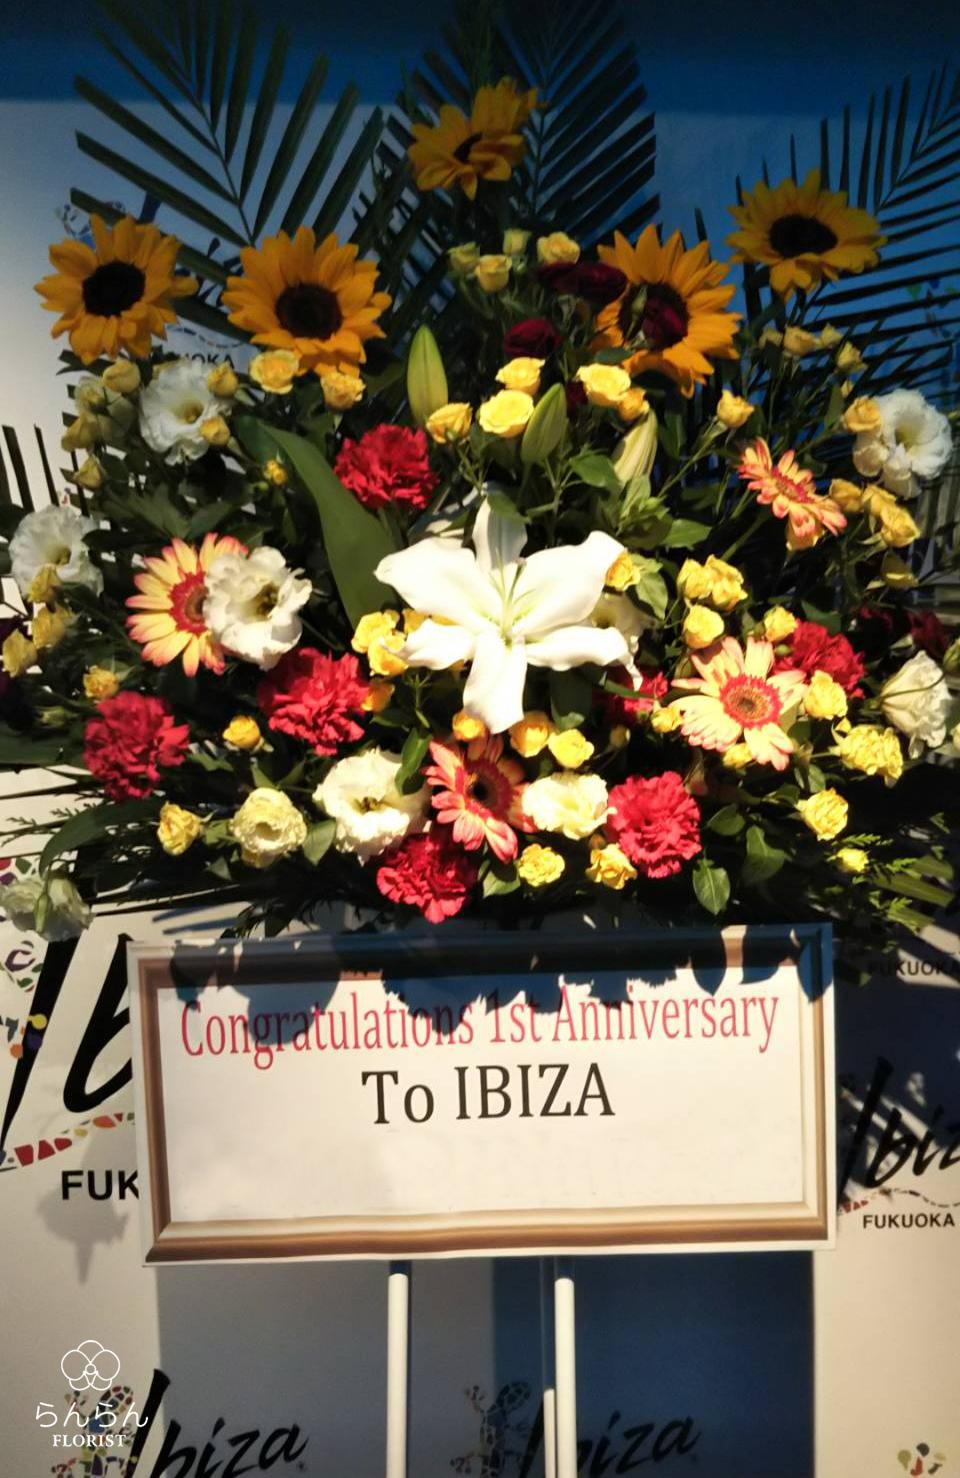 IBIZA FUKUOKA お祝いスタンド花